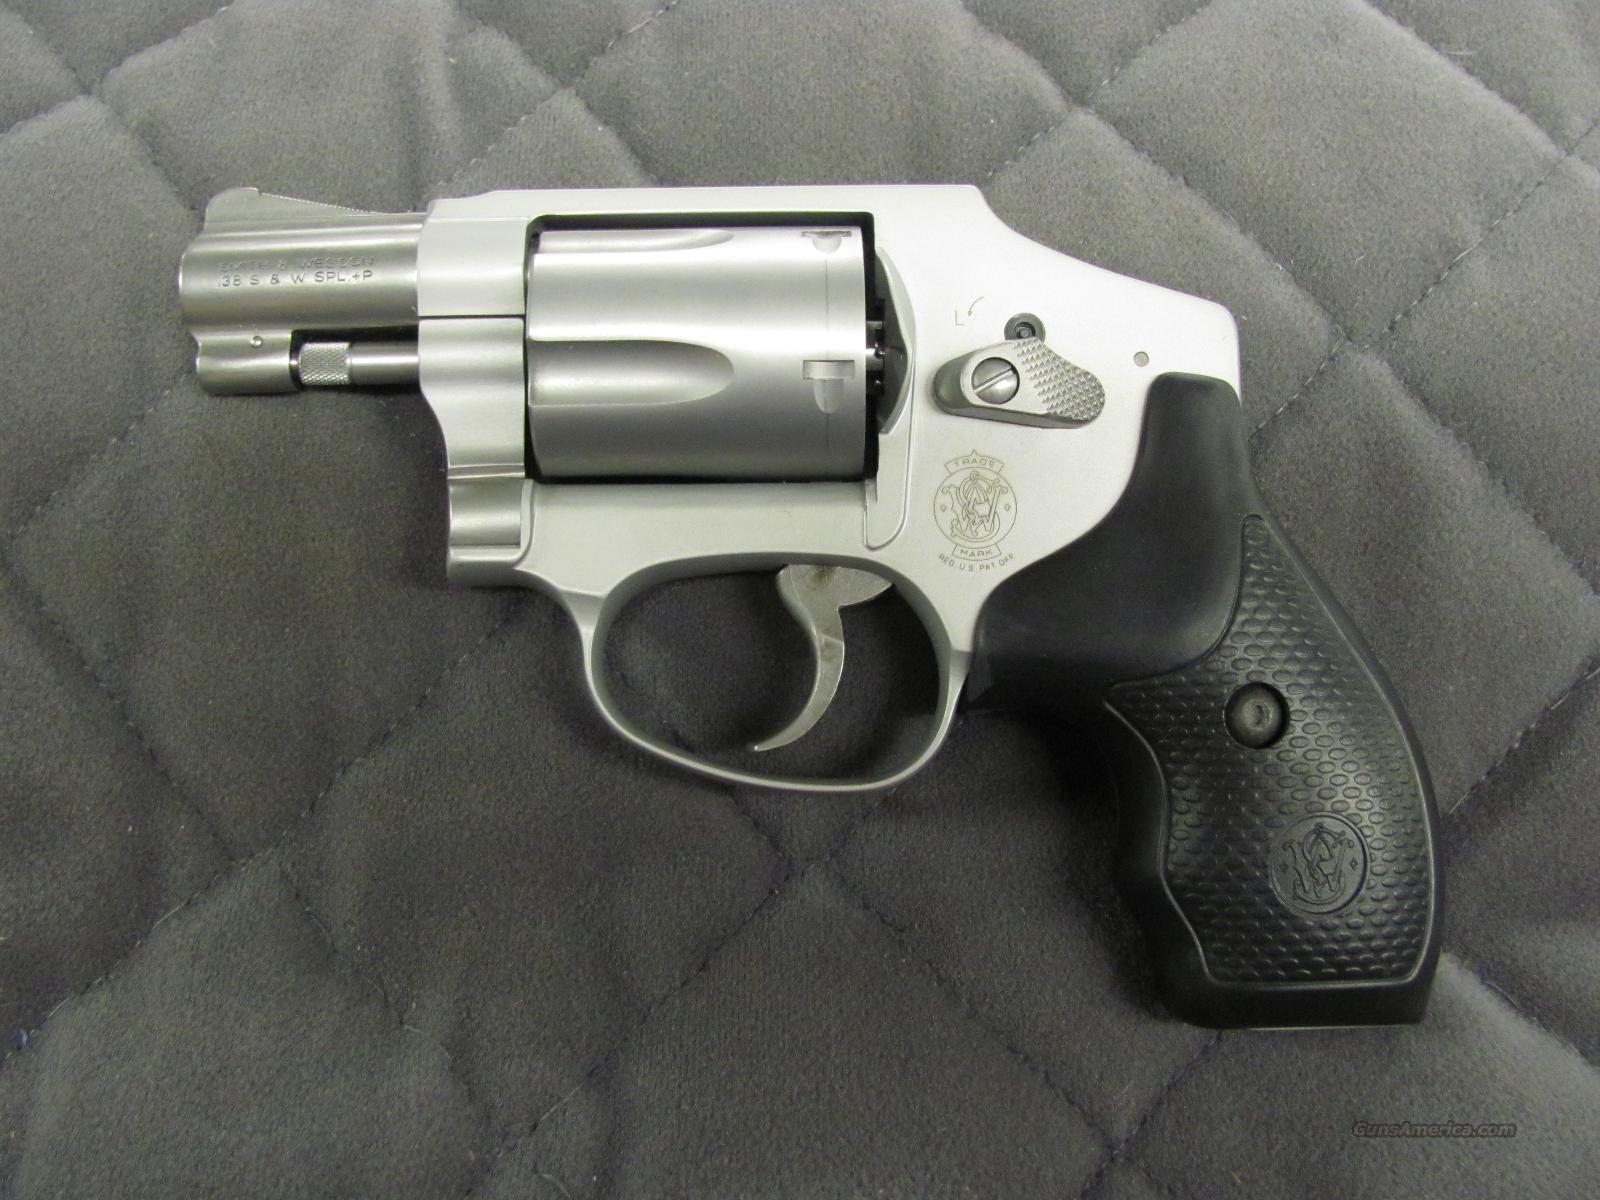 Smith & Wesson Model 642 .38 Special NO CC FEES 163810  Guns > Pistols > Smith & Wesson Revolvers > Pocket Pistols